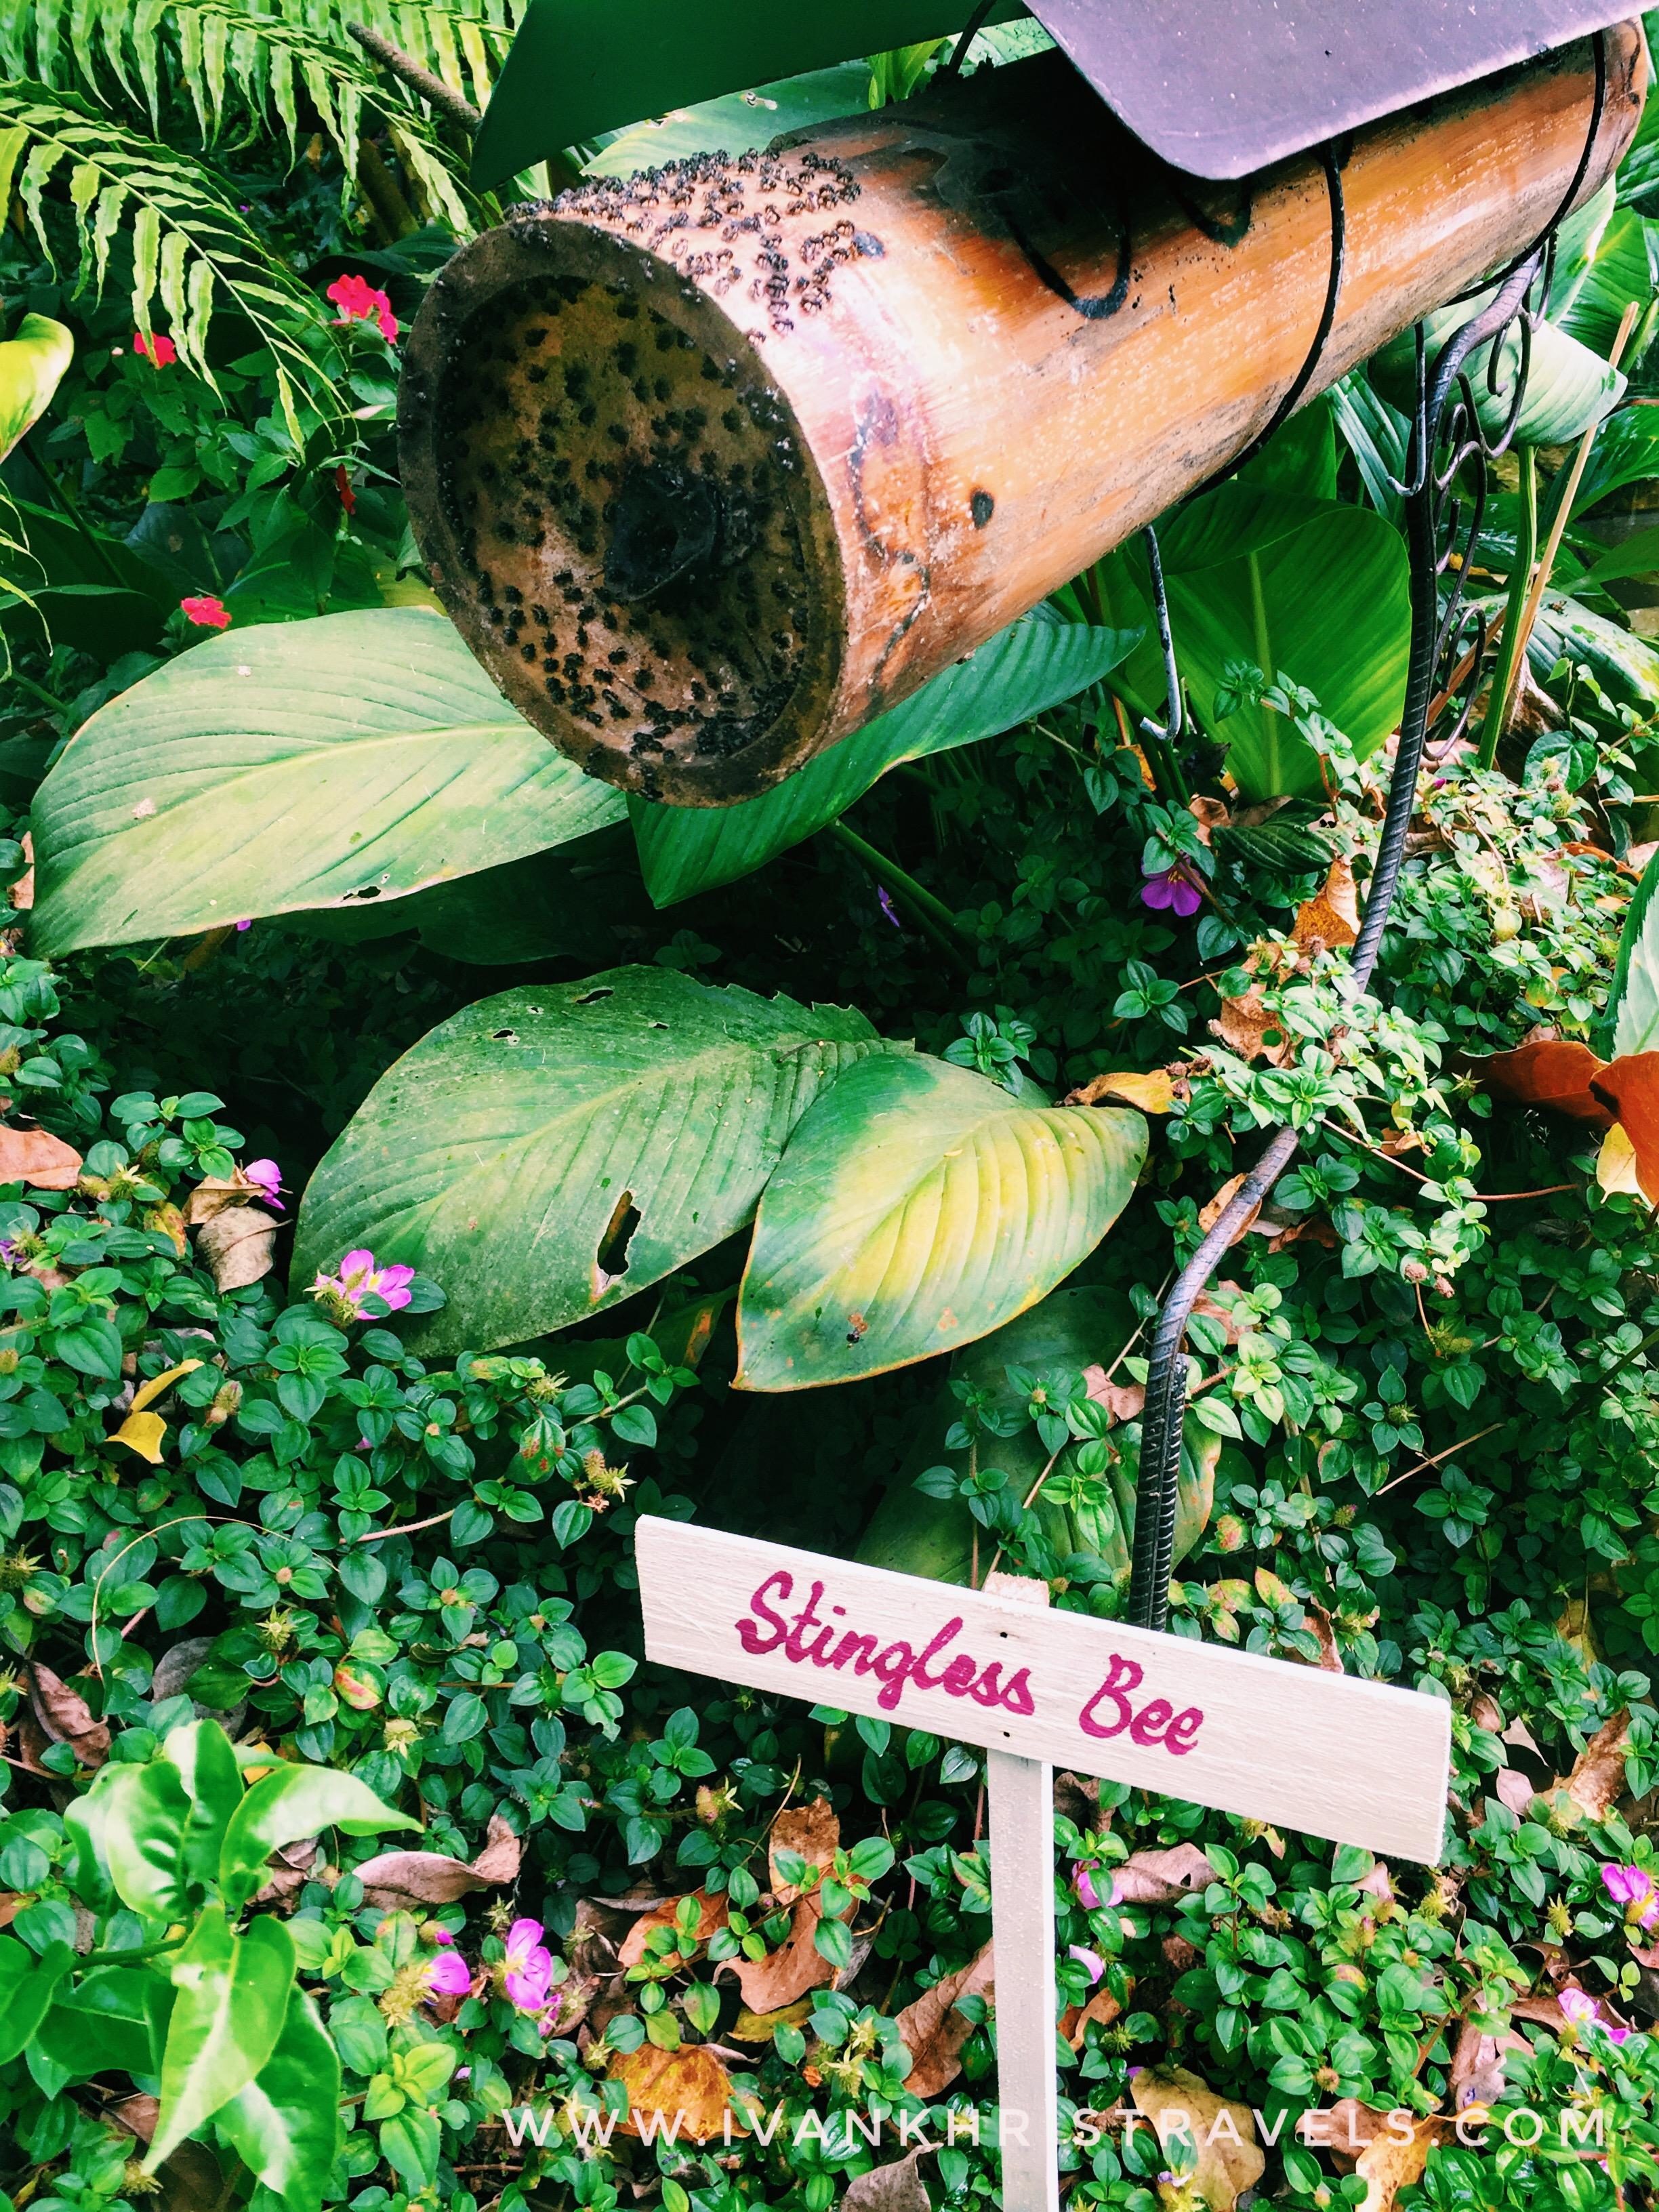 Sonya's Garden sting-less bees